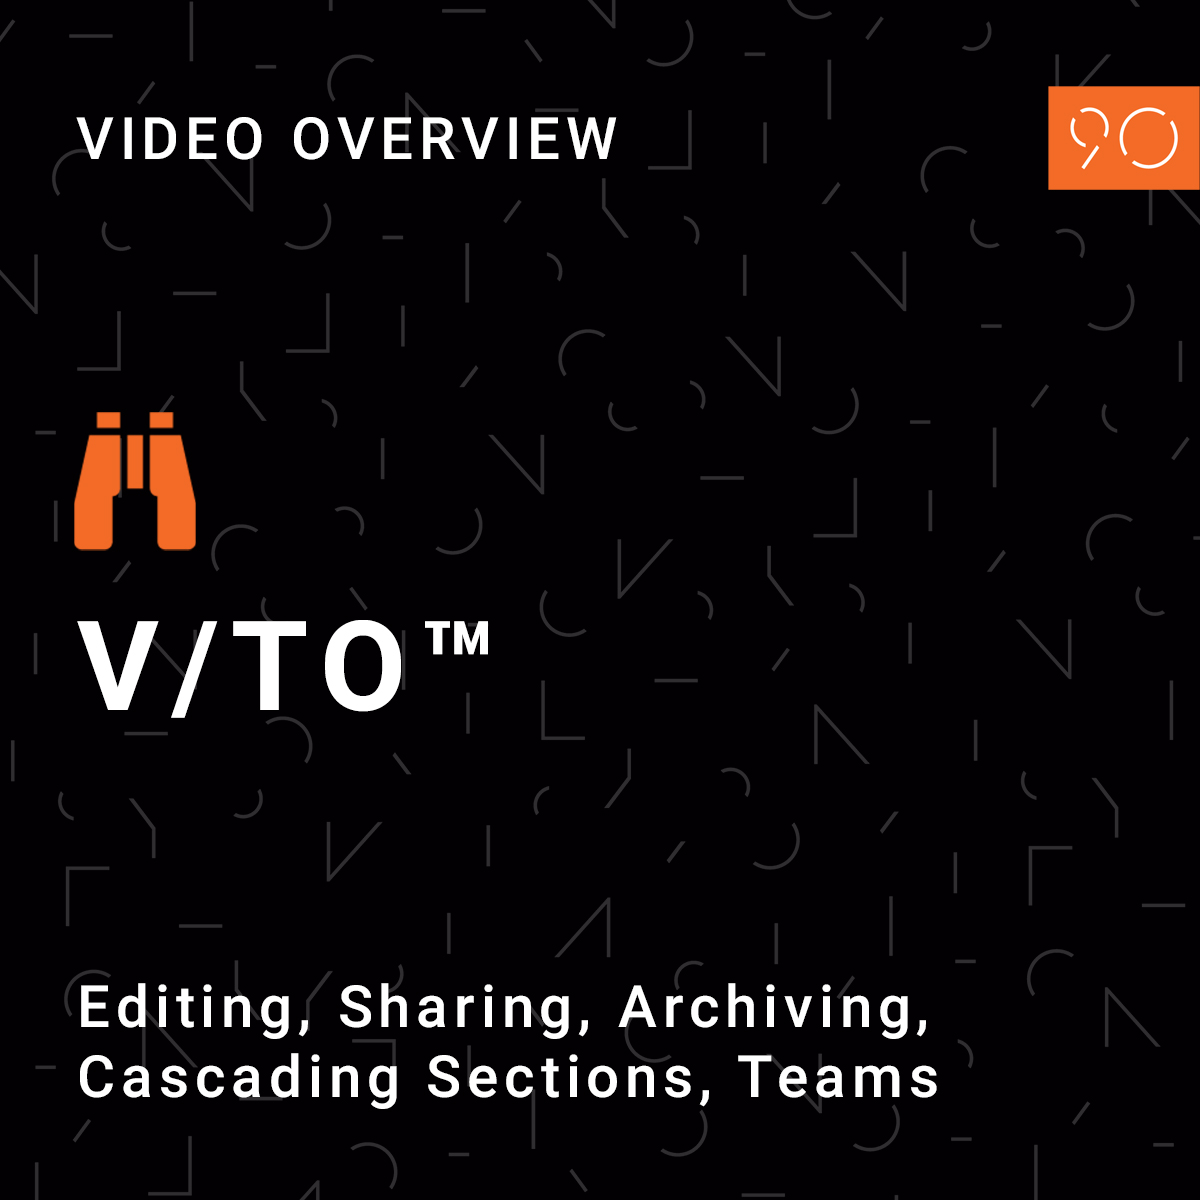 VTO-video overview tiles